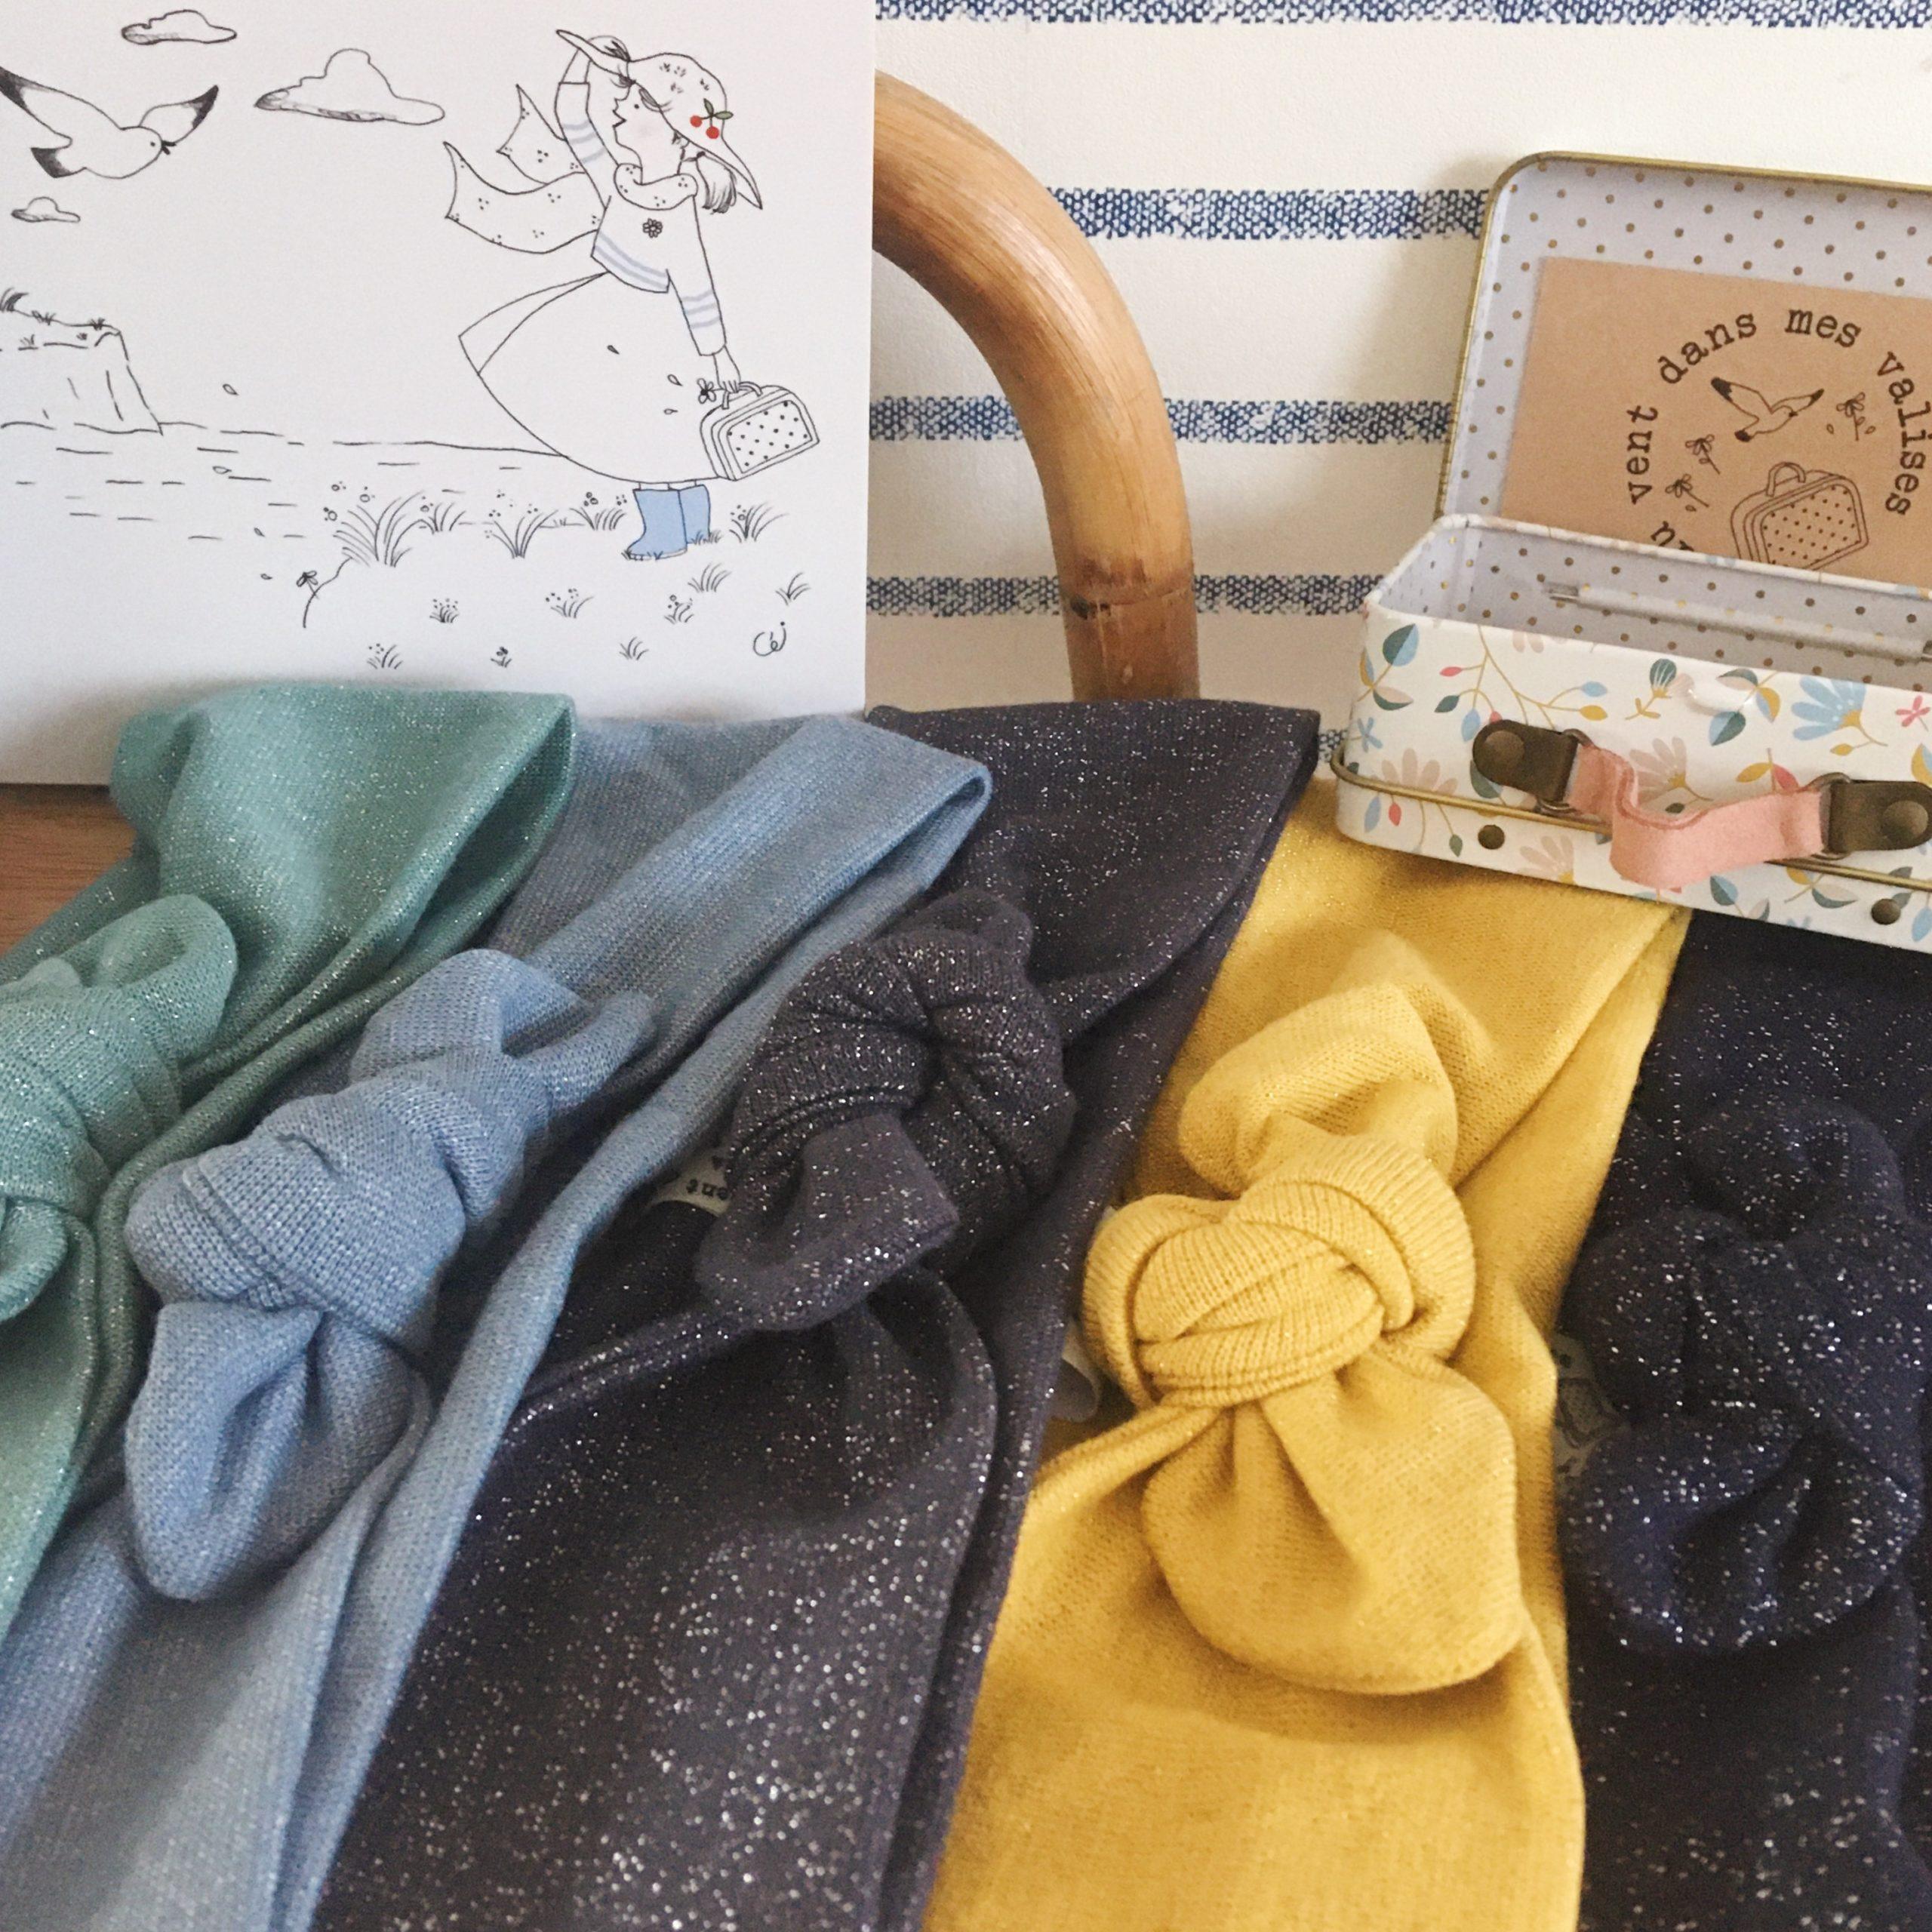 bandeaux extensibles et adaptables femmes filles made in France - du vent dans mes valises